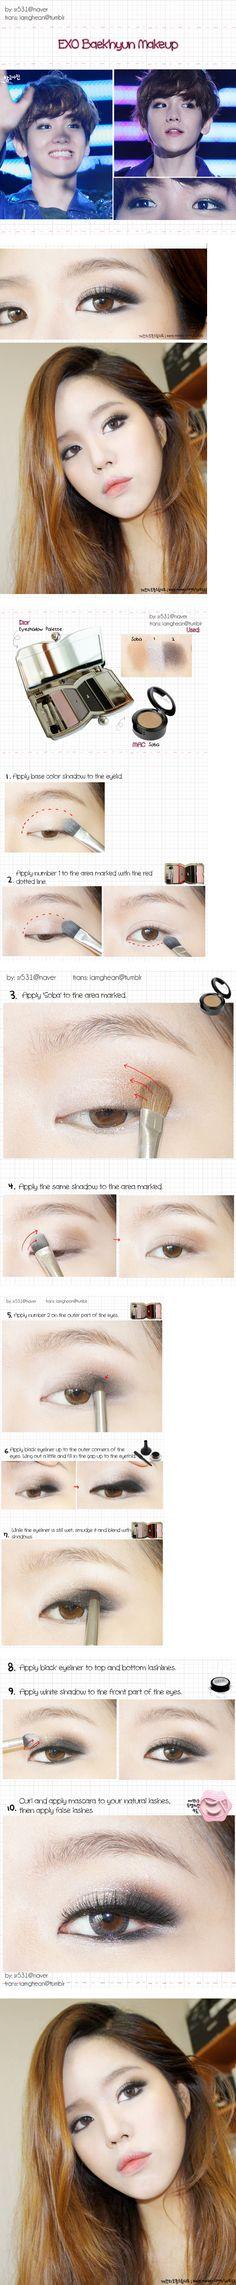 EXO Baekhyun Makeup Tutorial Credit: iamghean@tumblr